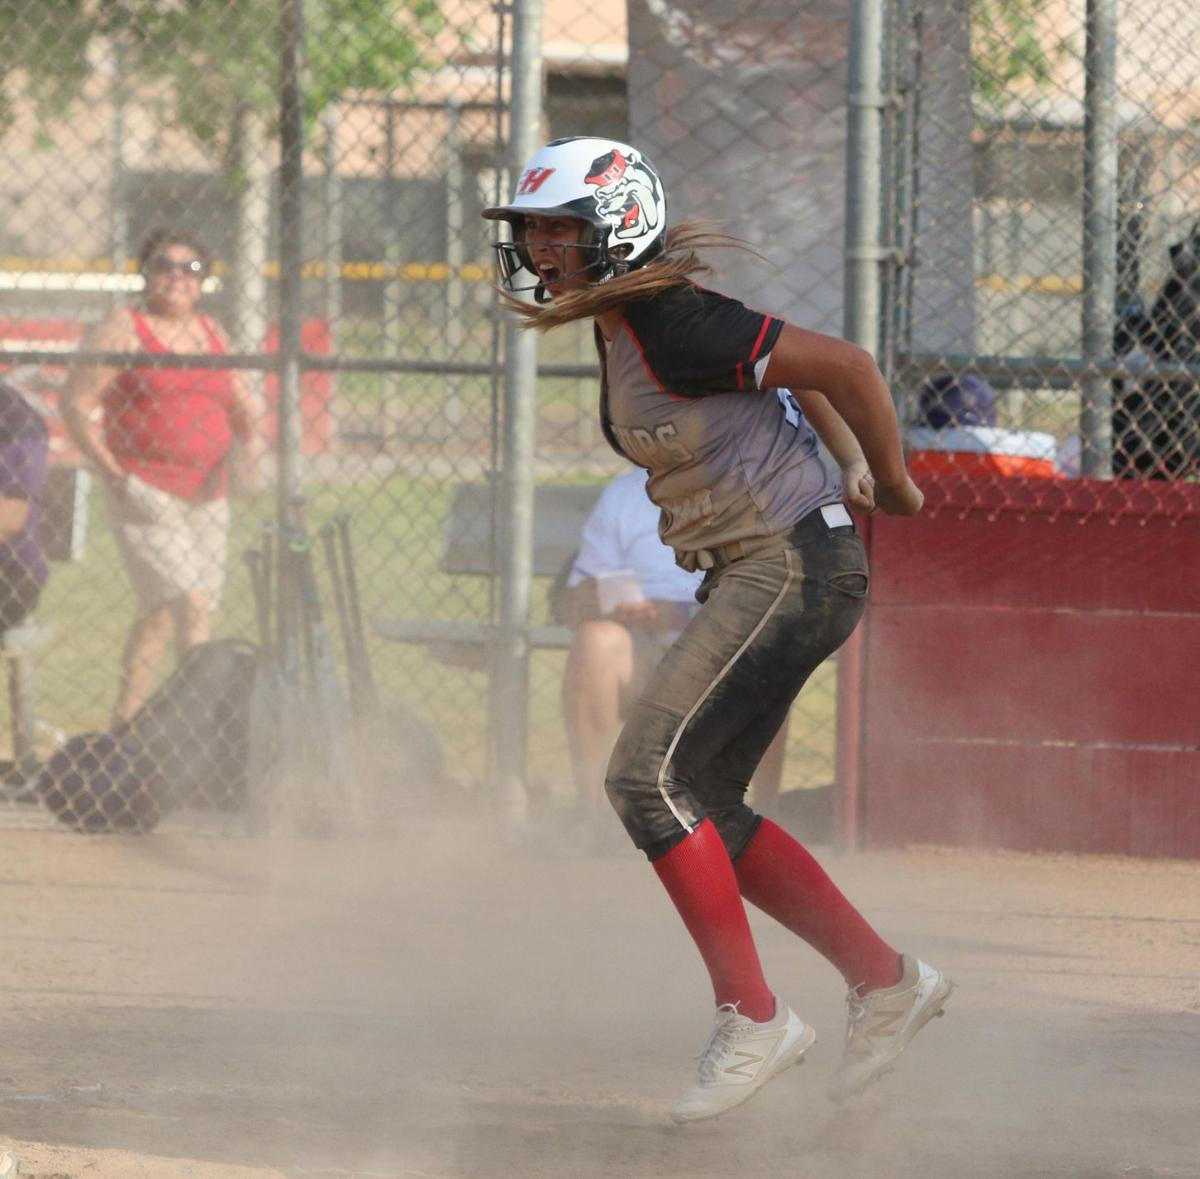 Bullpups use big sixth inning to reach semifinals